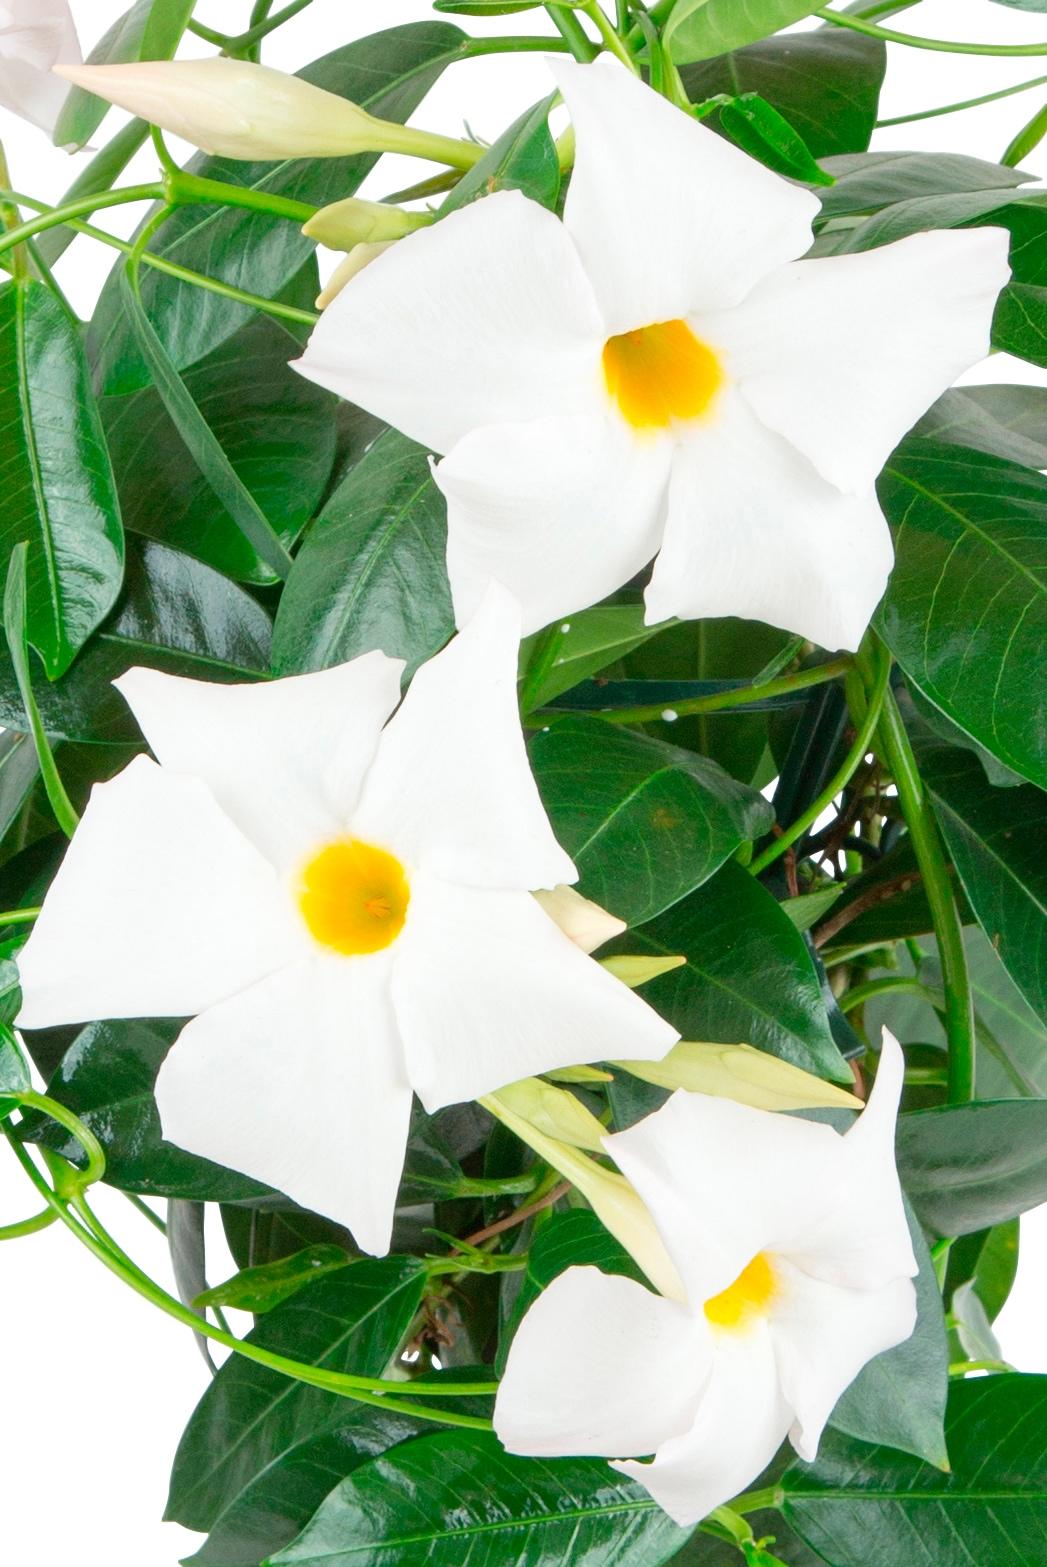 BCM Beetpflanze Jade White, Höhe: 45 cm weiß Beetpflanzen Pflanzen Garten Balkon